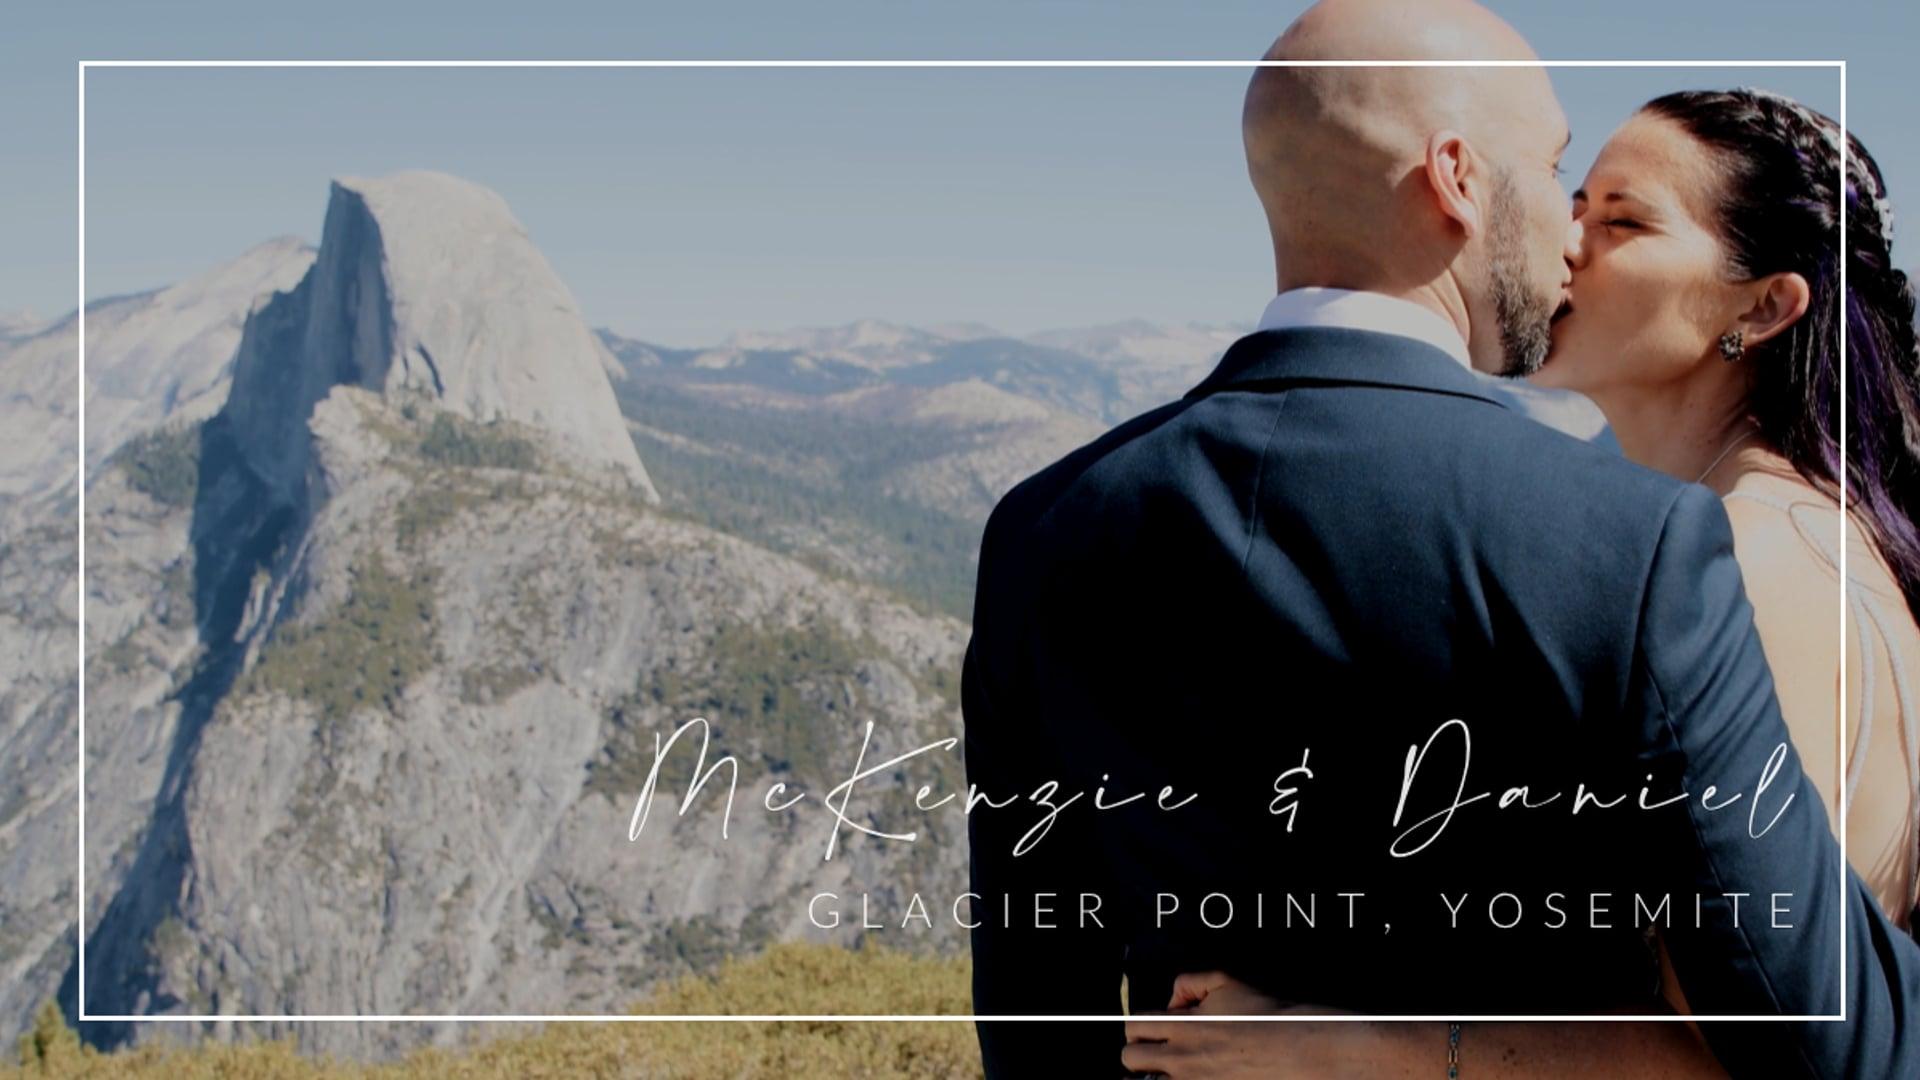 McKenzie & Daniel // Glacier Point Wedding